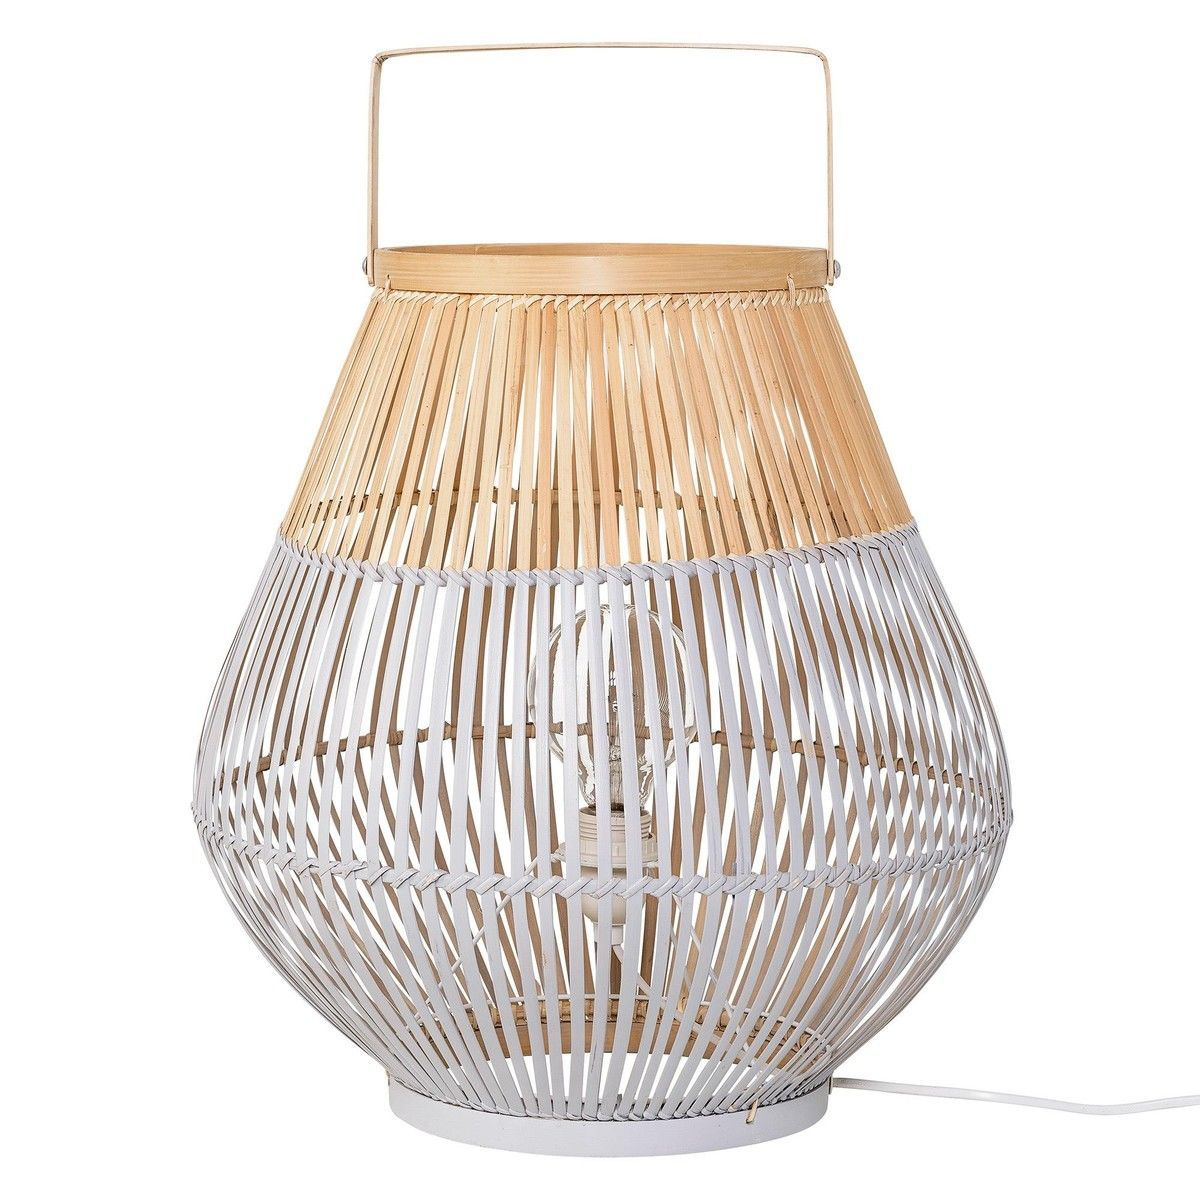 Bamboo Floor Lamp   Bloomingville   AmbienteDirect.com